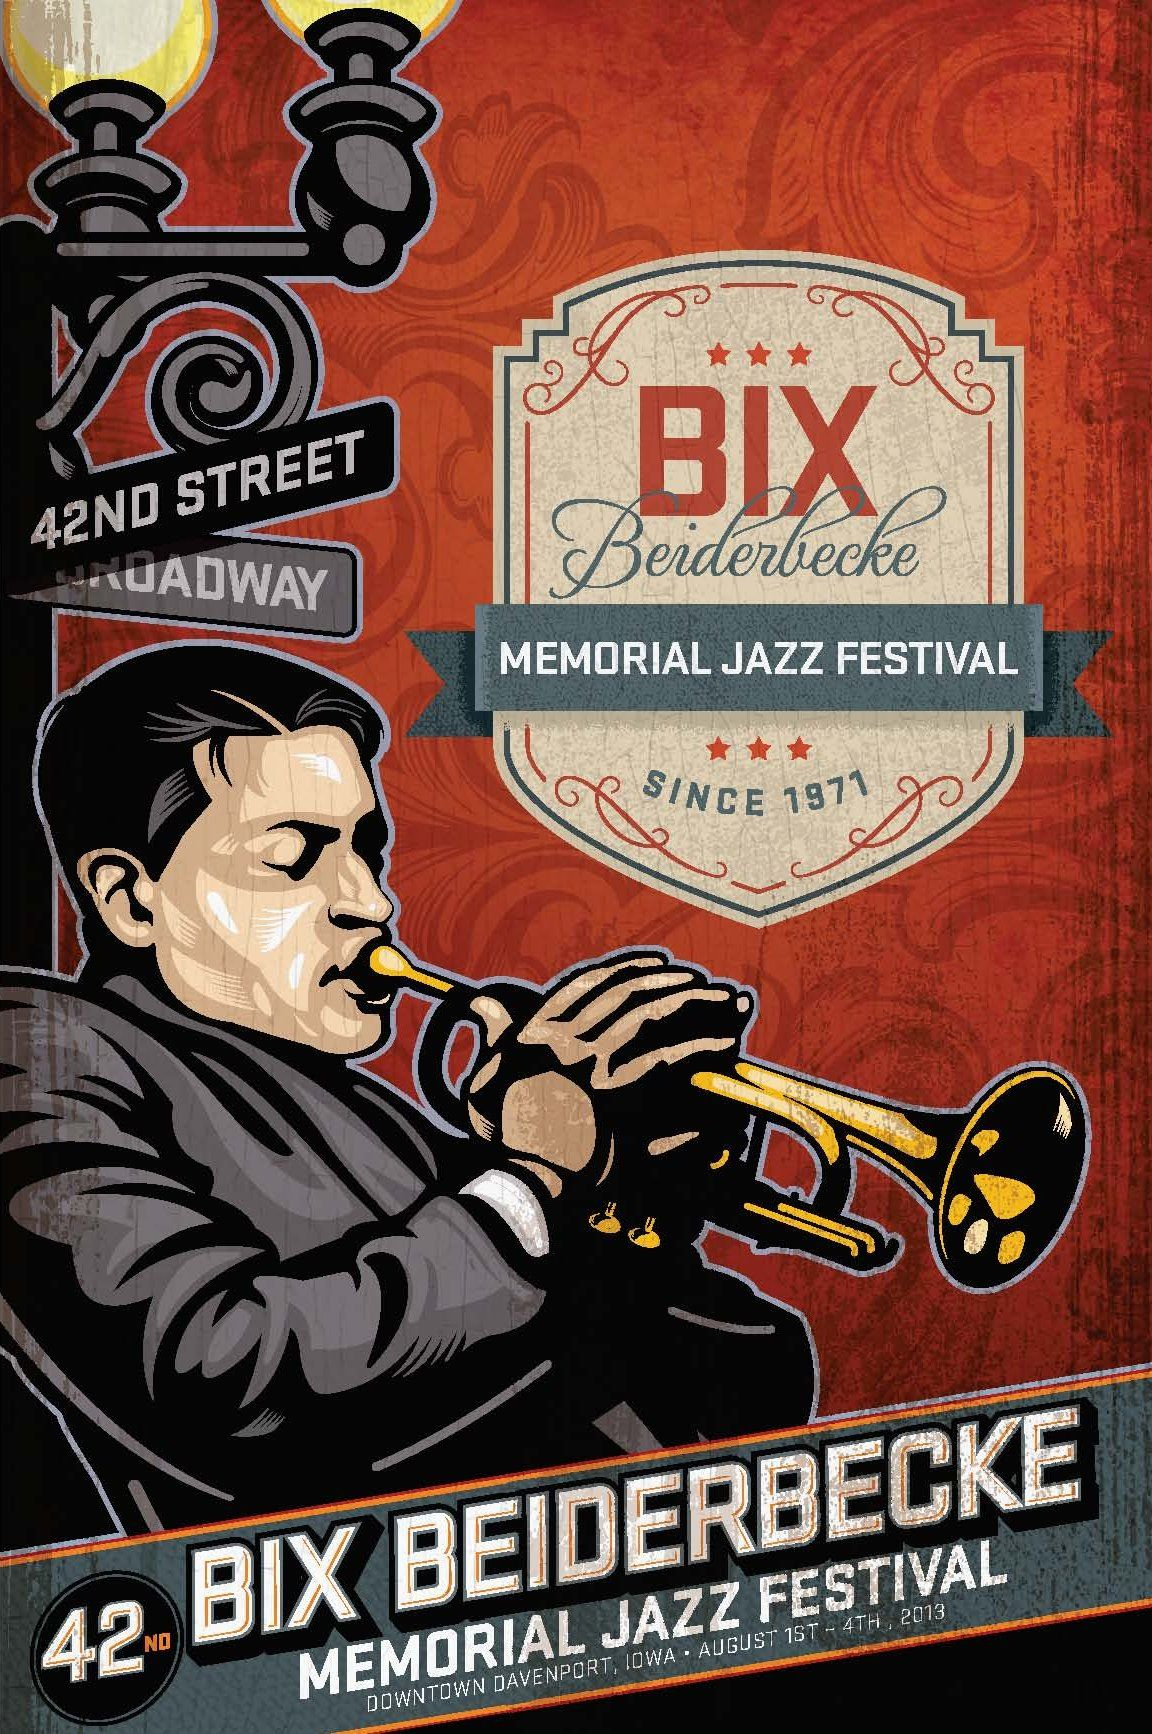 big band 42nd street